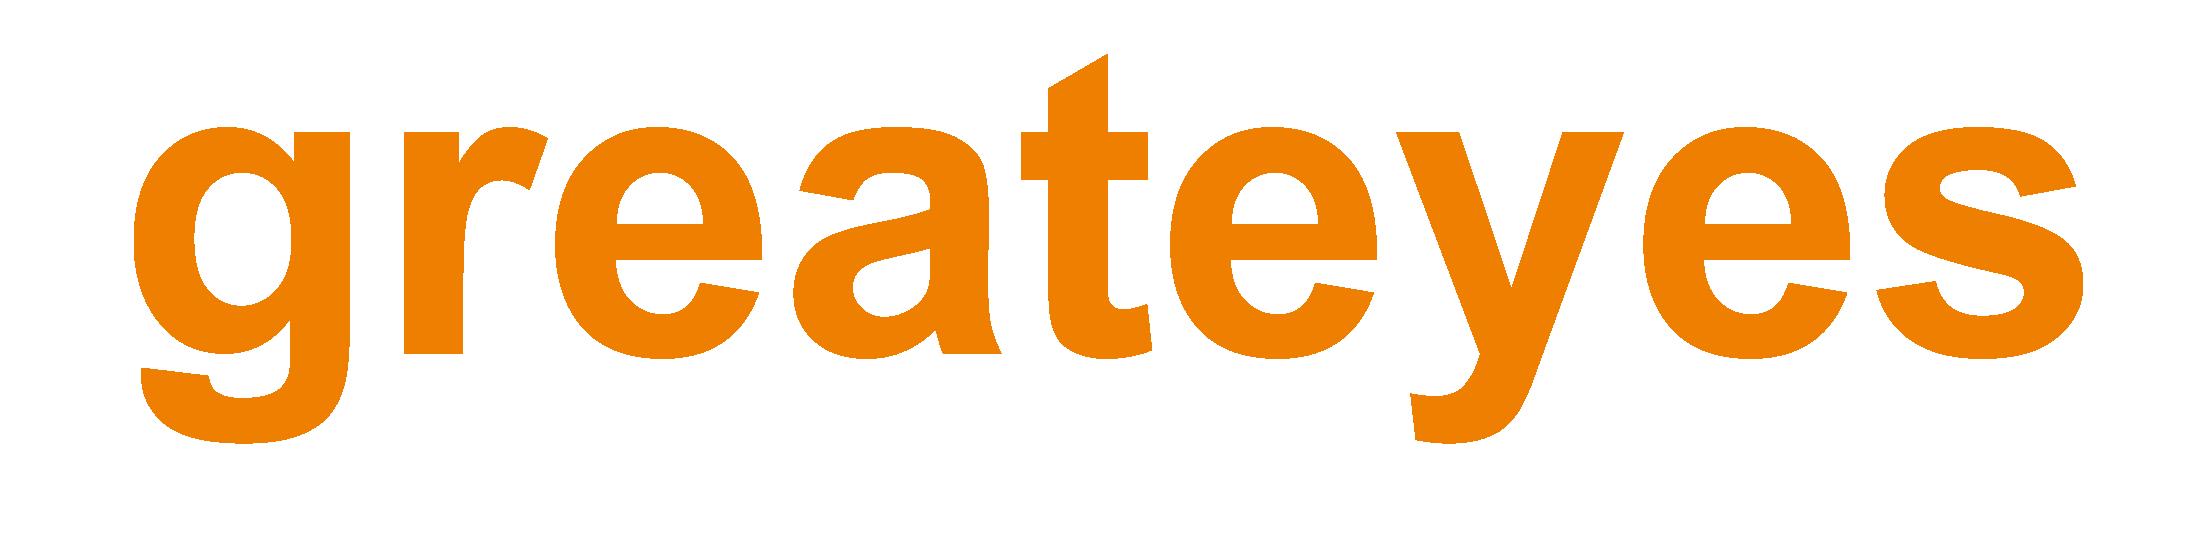 greateyes_logo